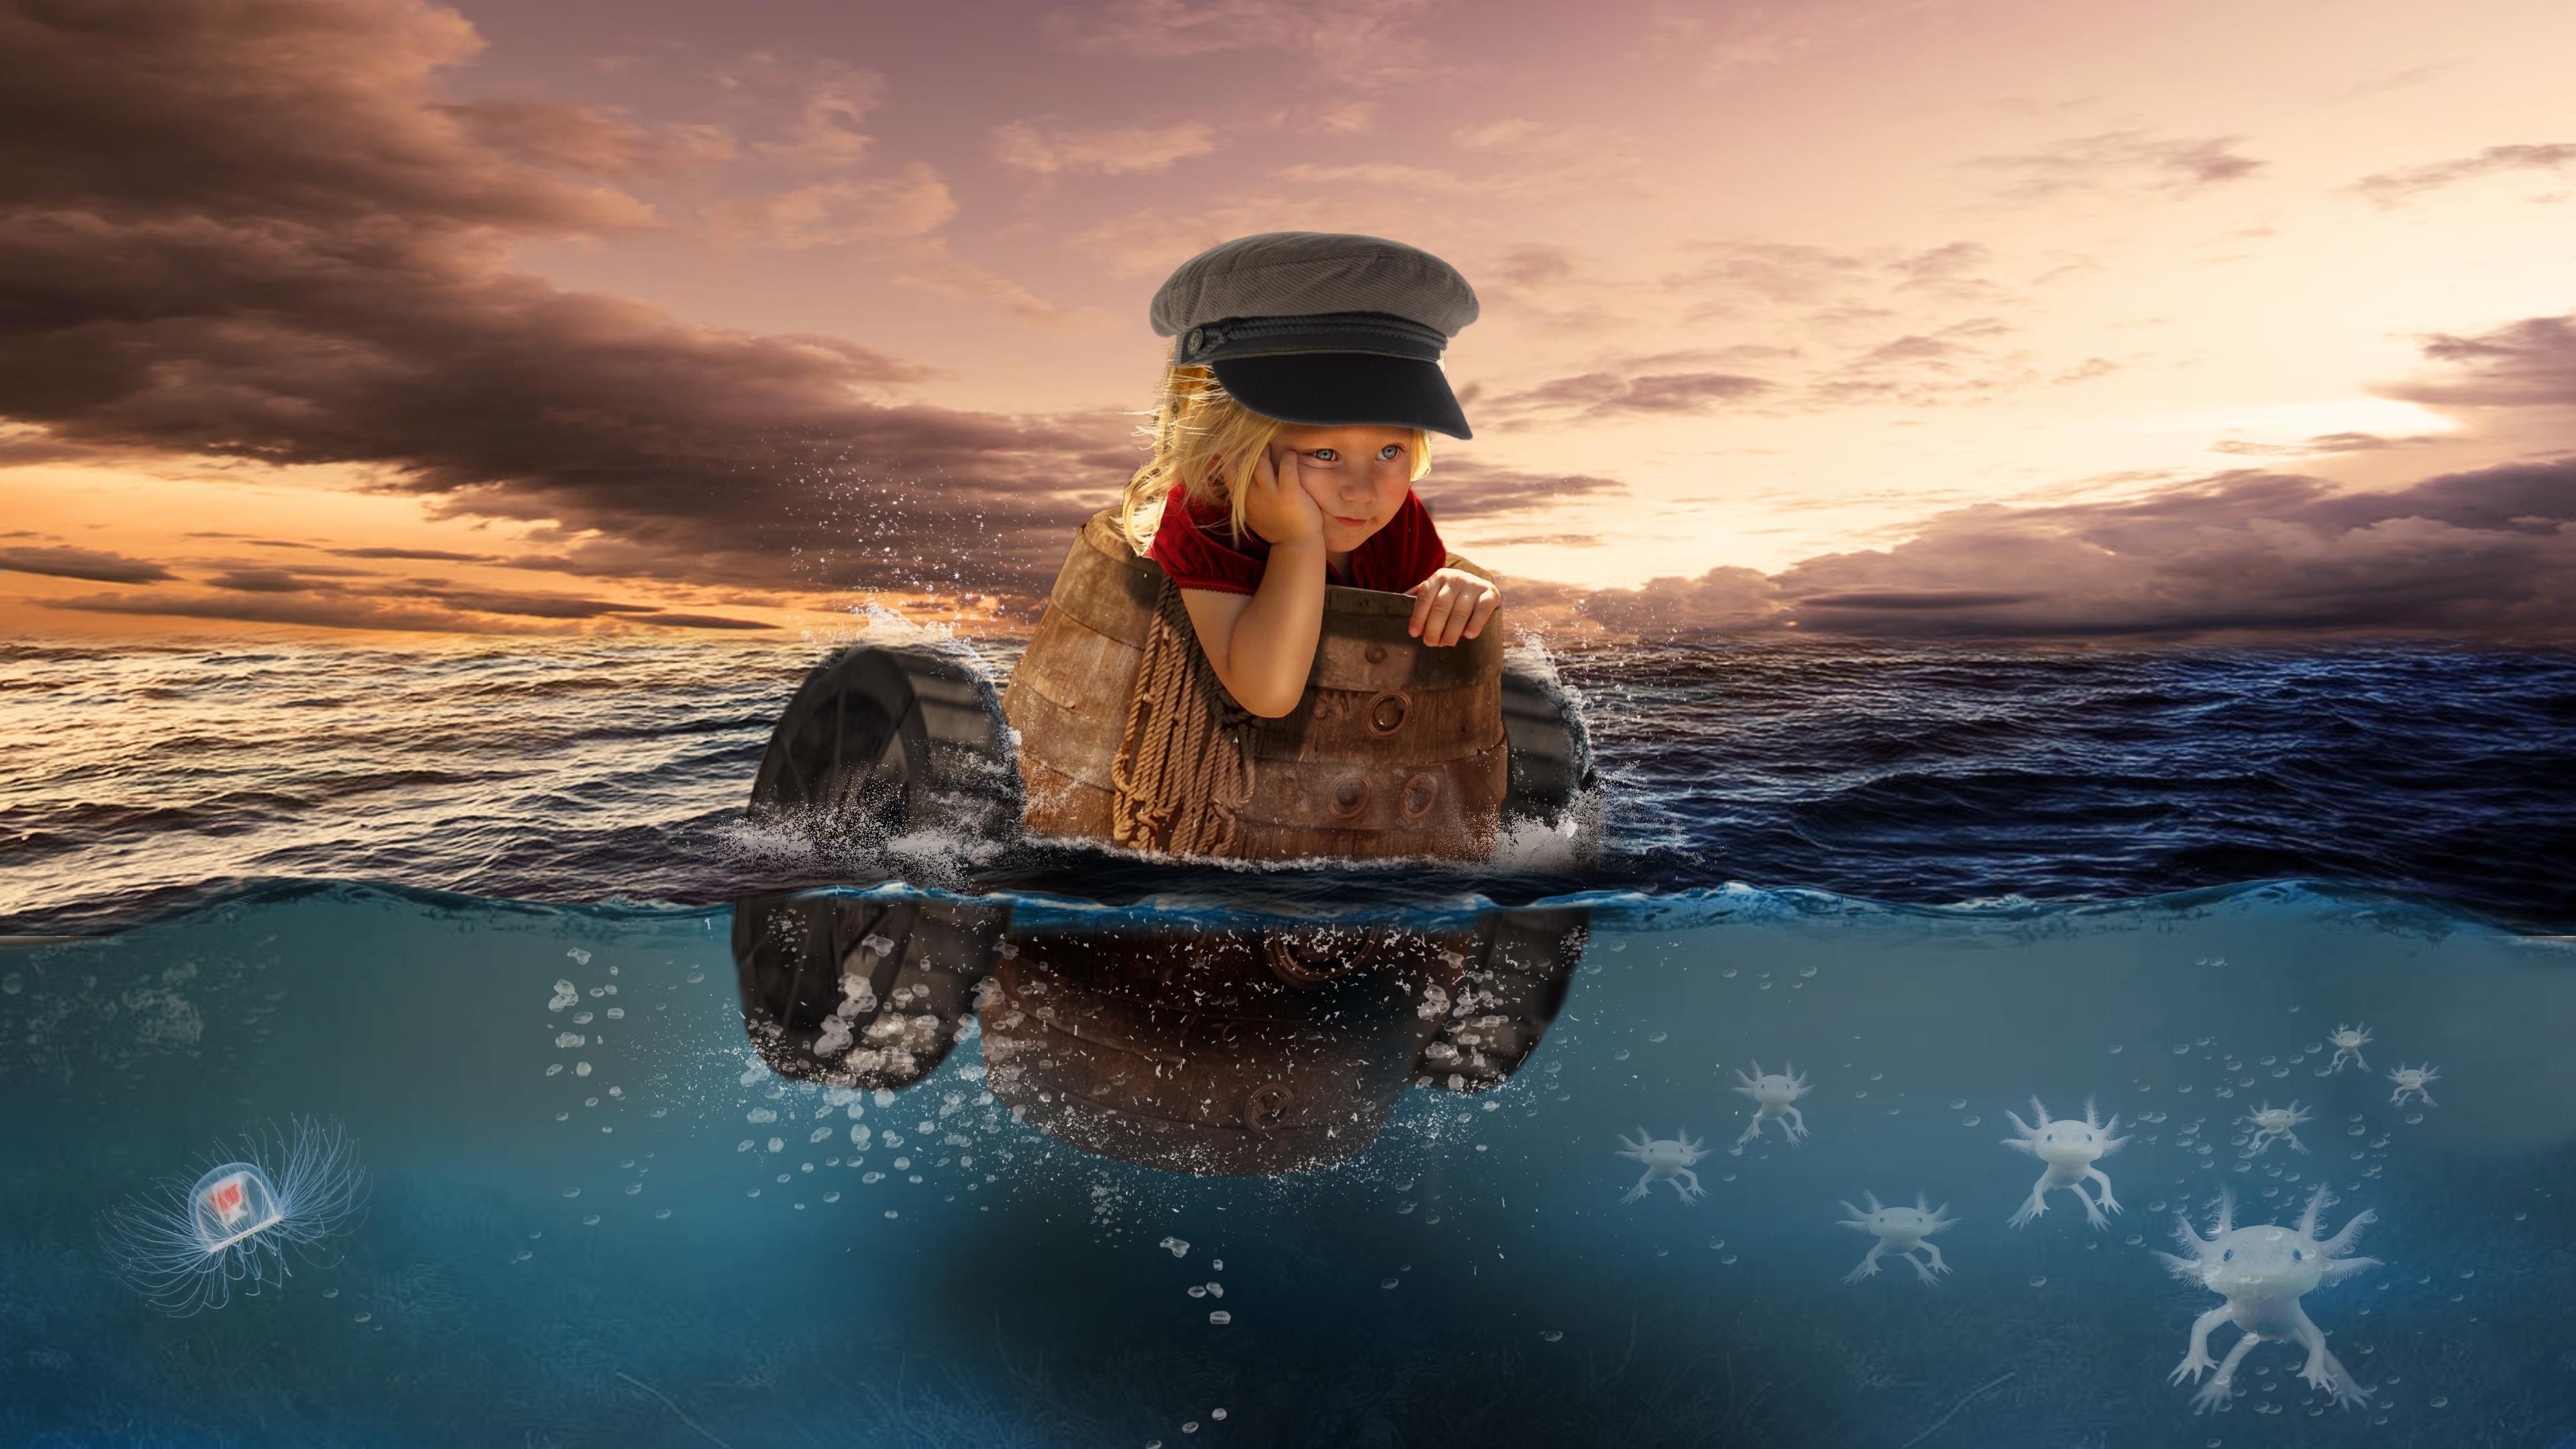 Обои закат, море, девочка, бочка